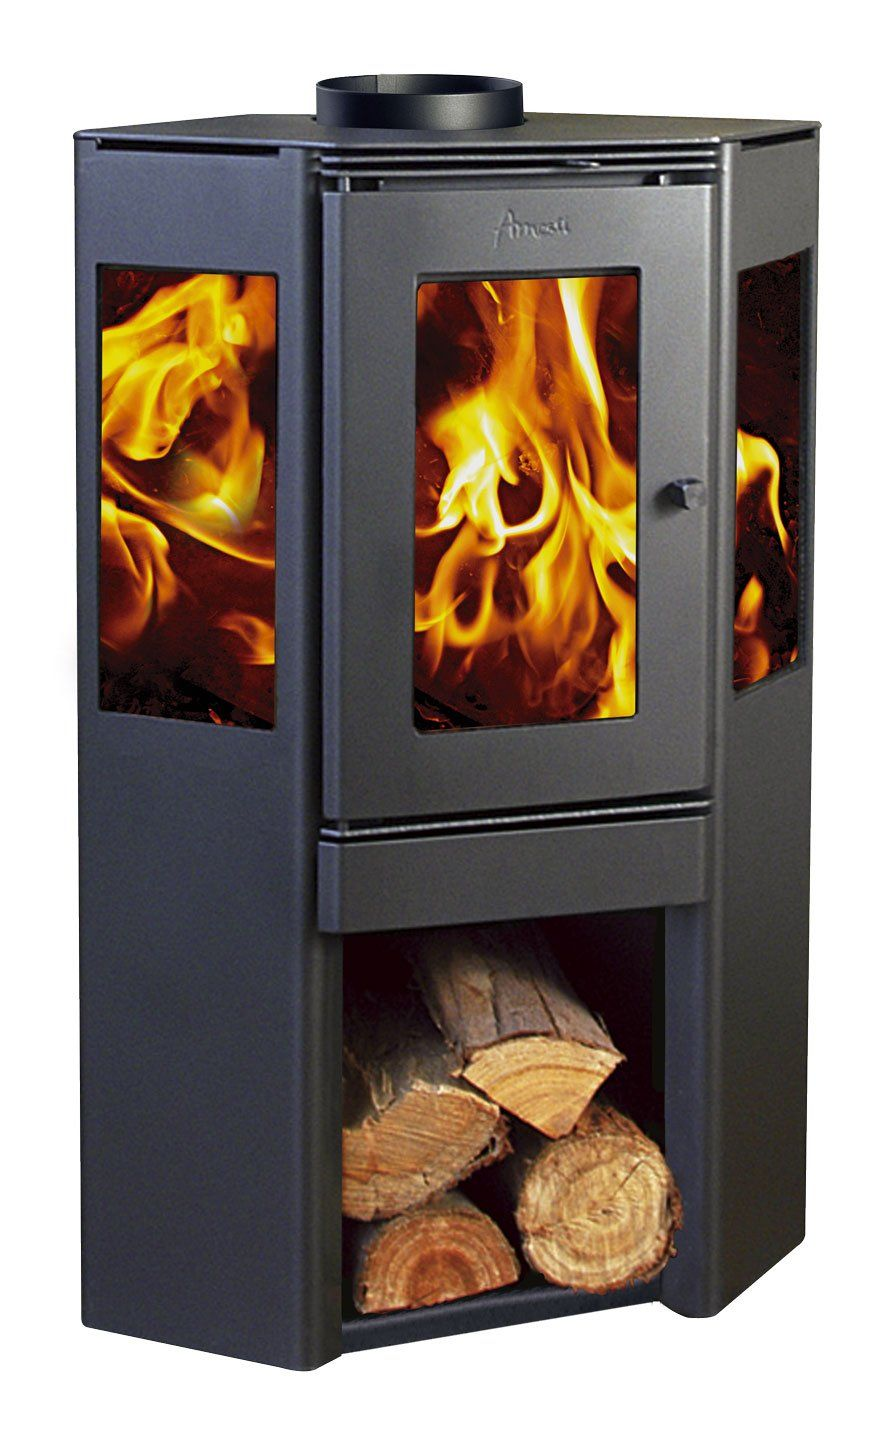 Inredning vedeldad varmvattenberedare : Wood Stove Amesti-corner 650. | Wood stoves | Pinterest